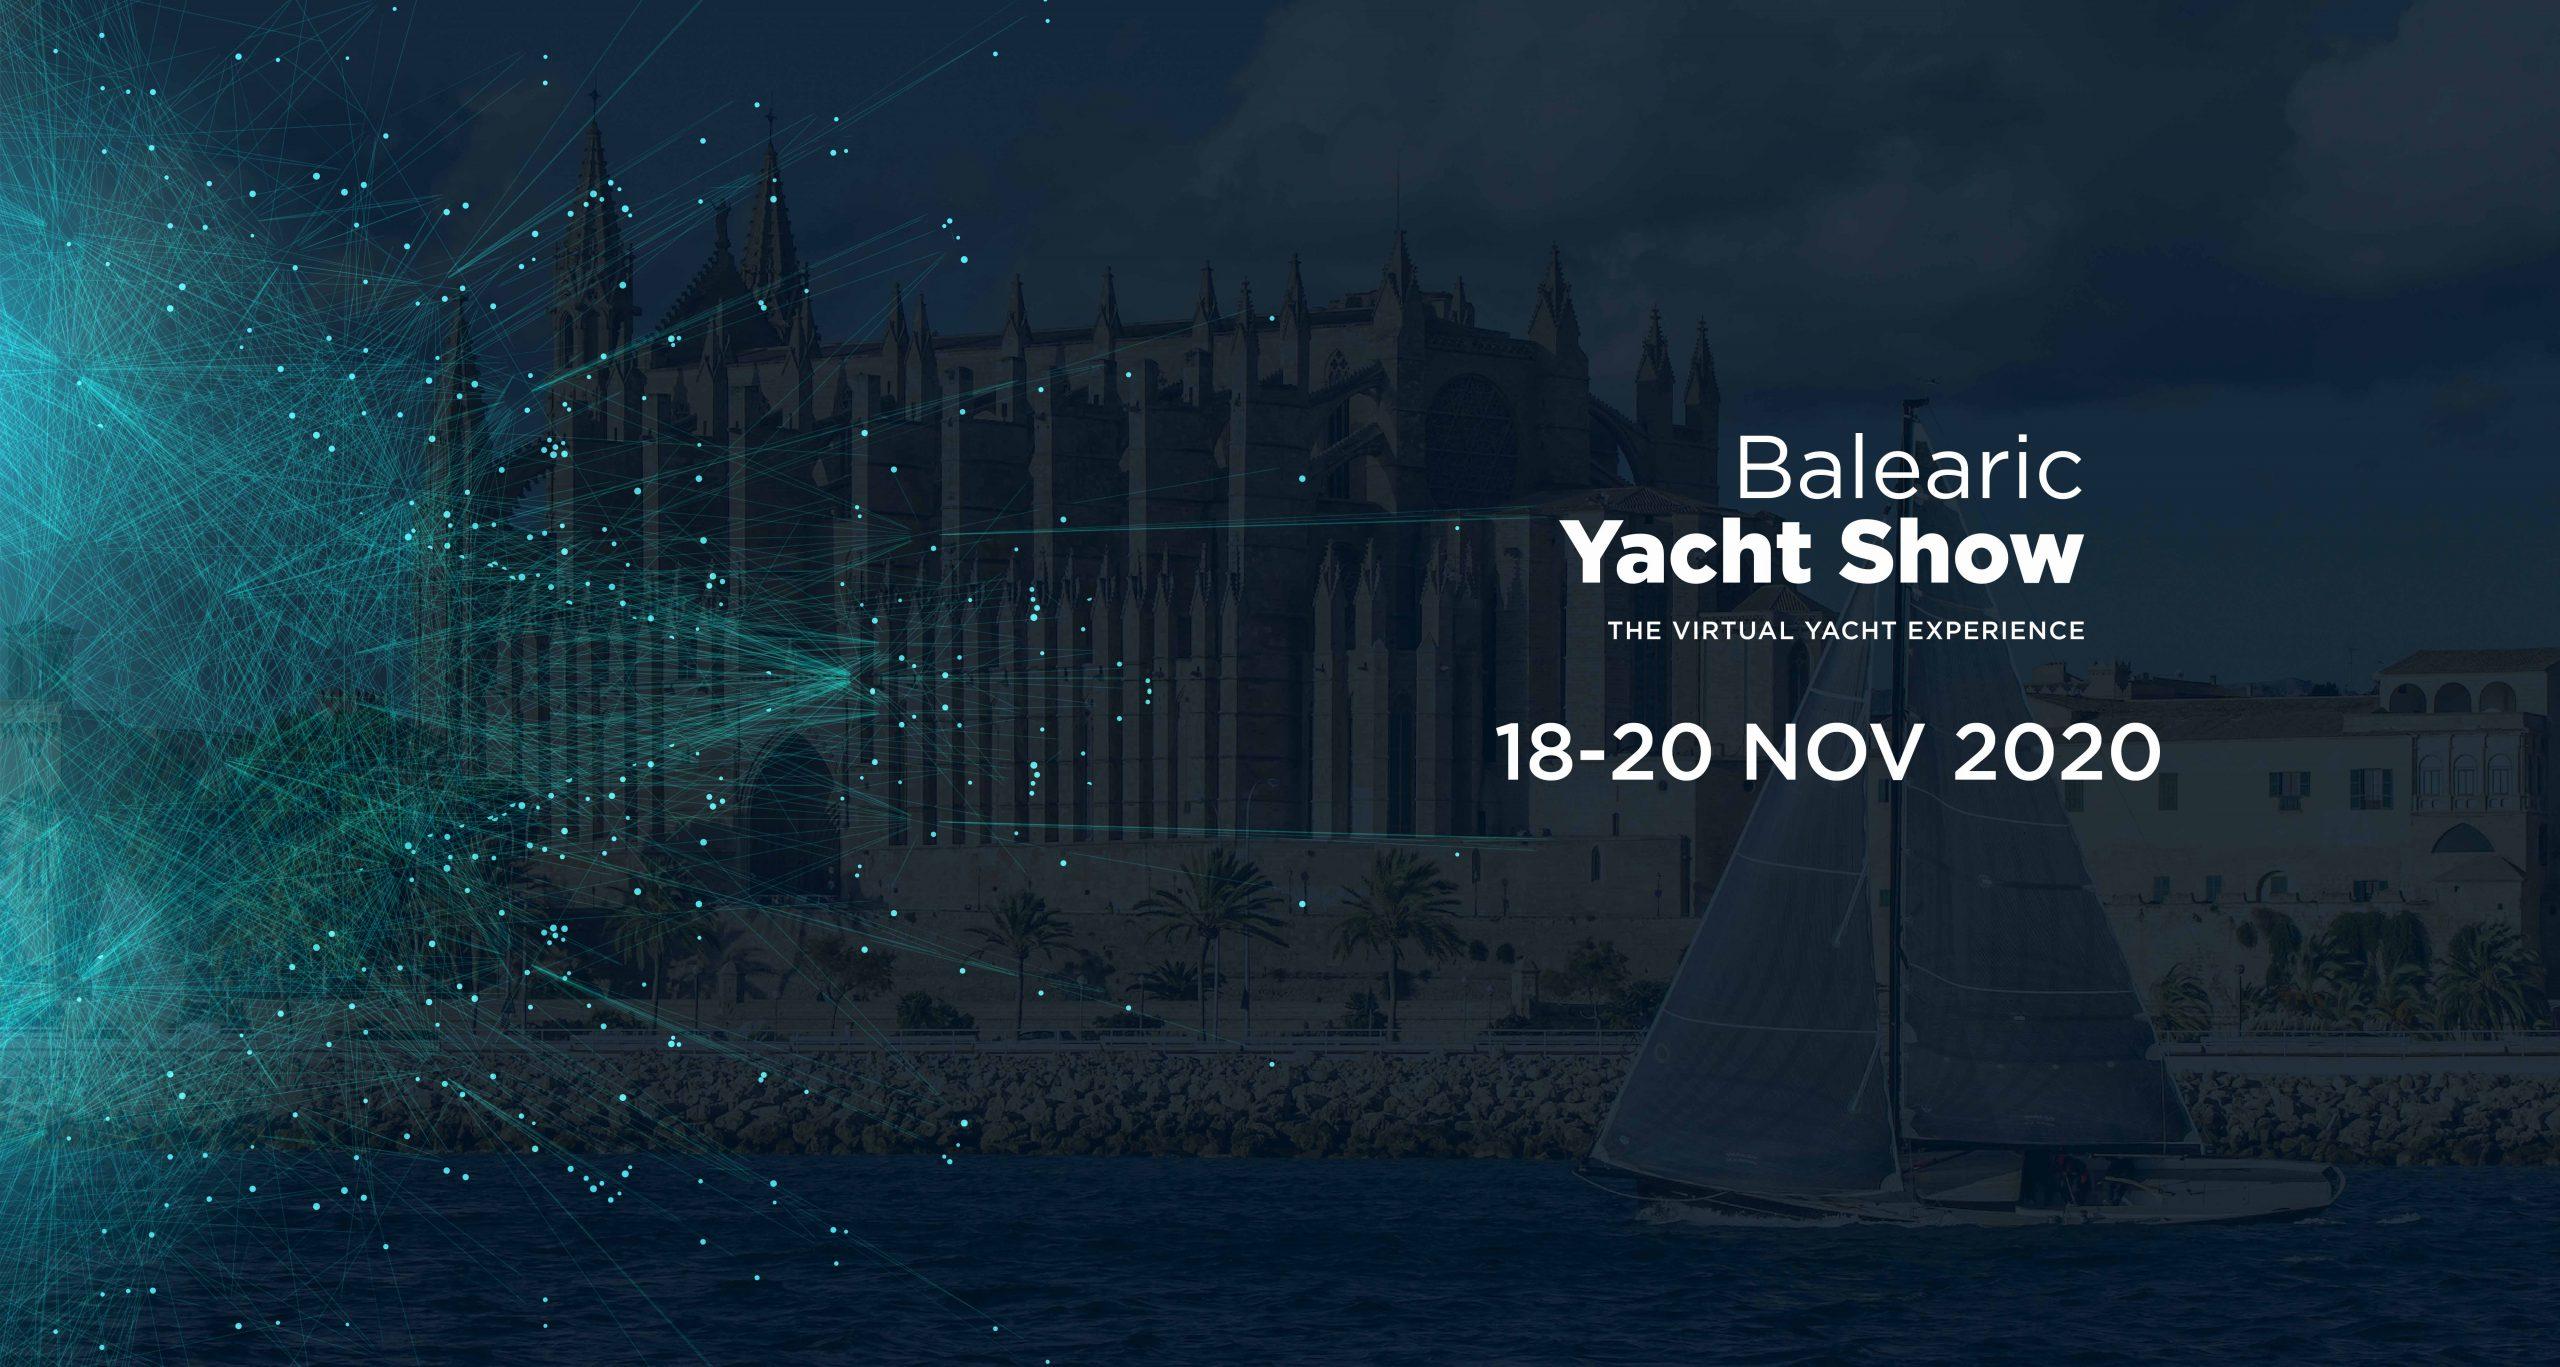 Lanzamiento del proyecto Balearic Yacht Show